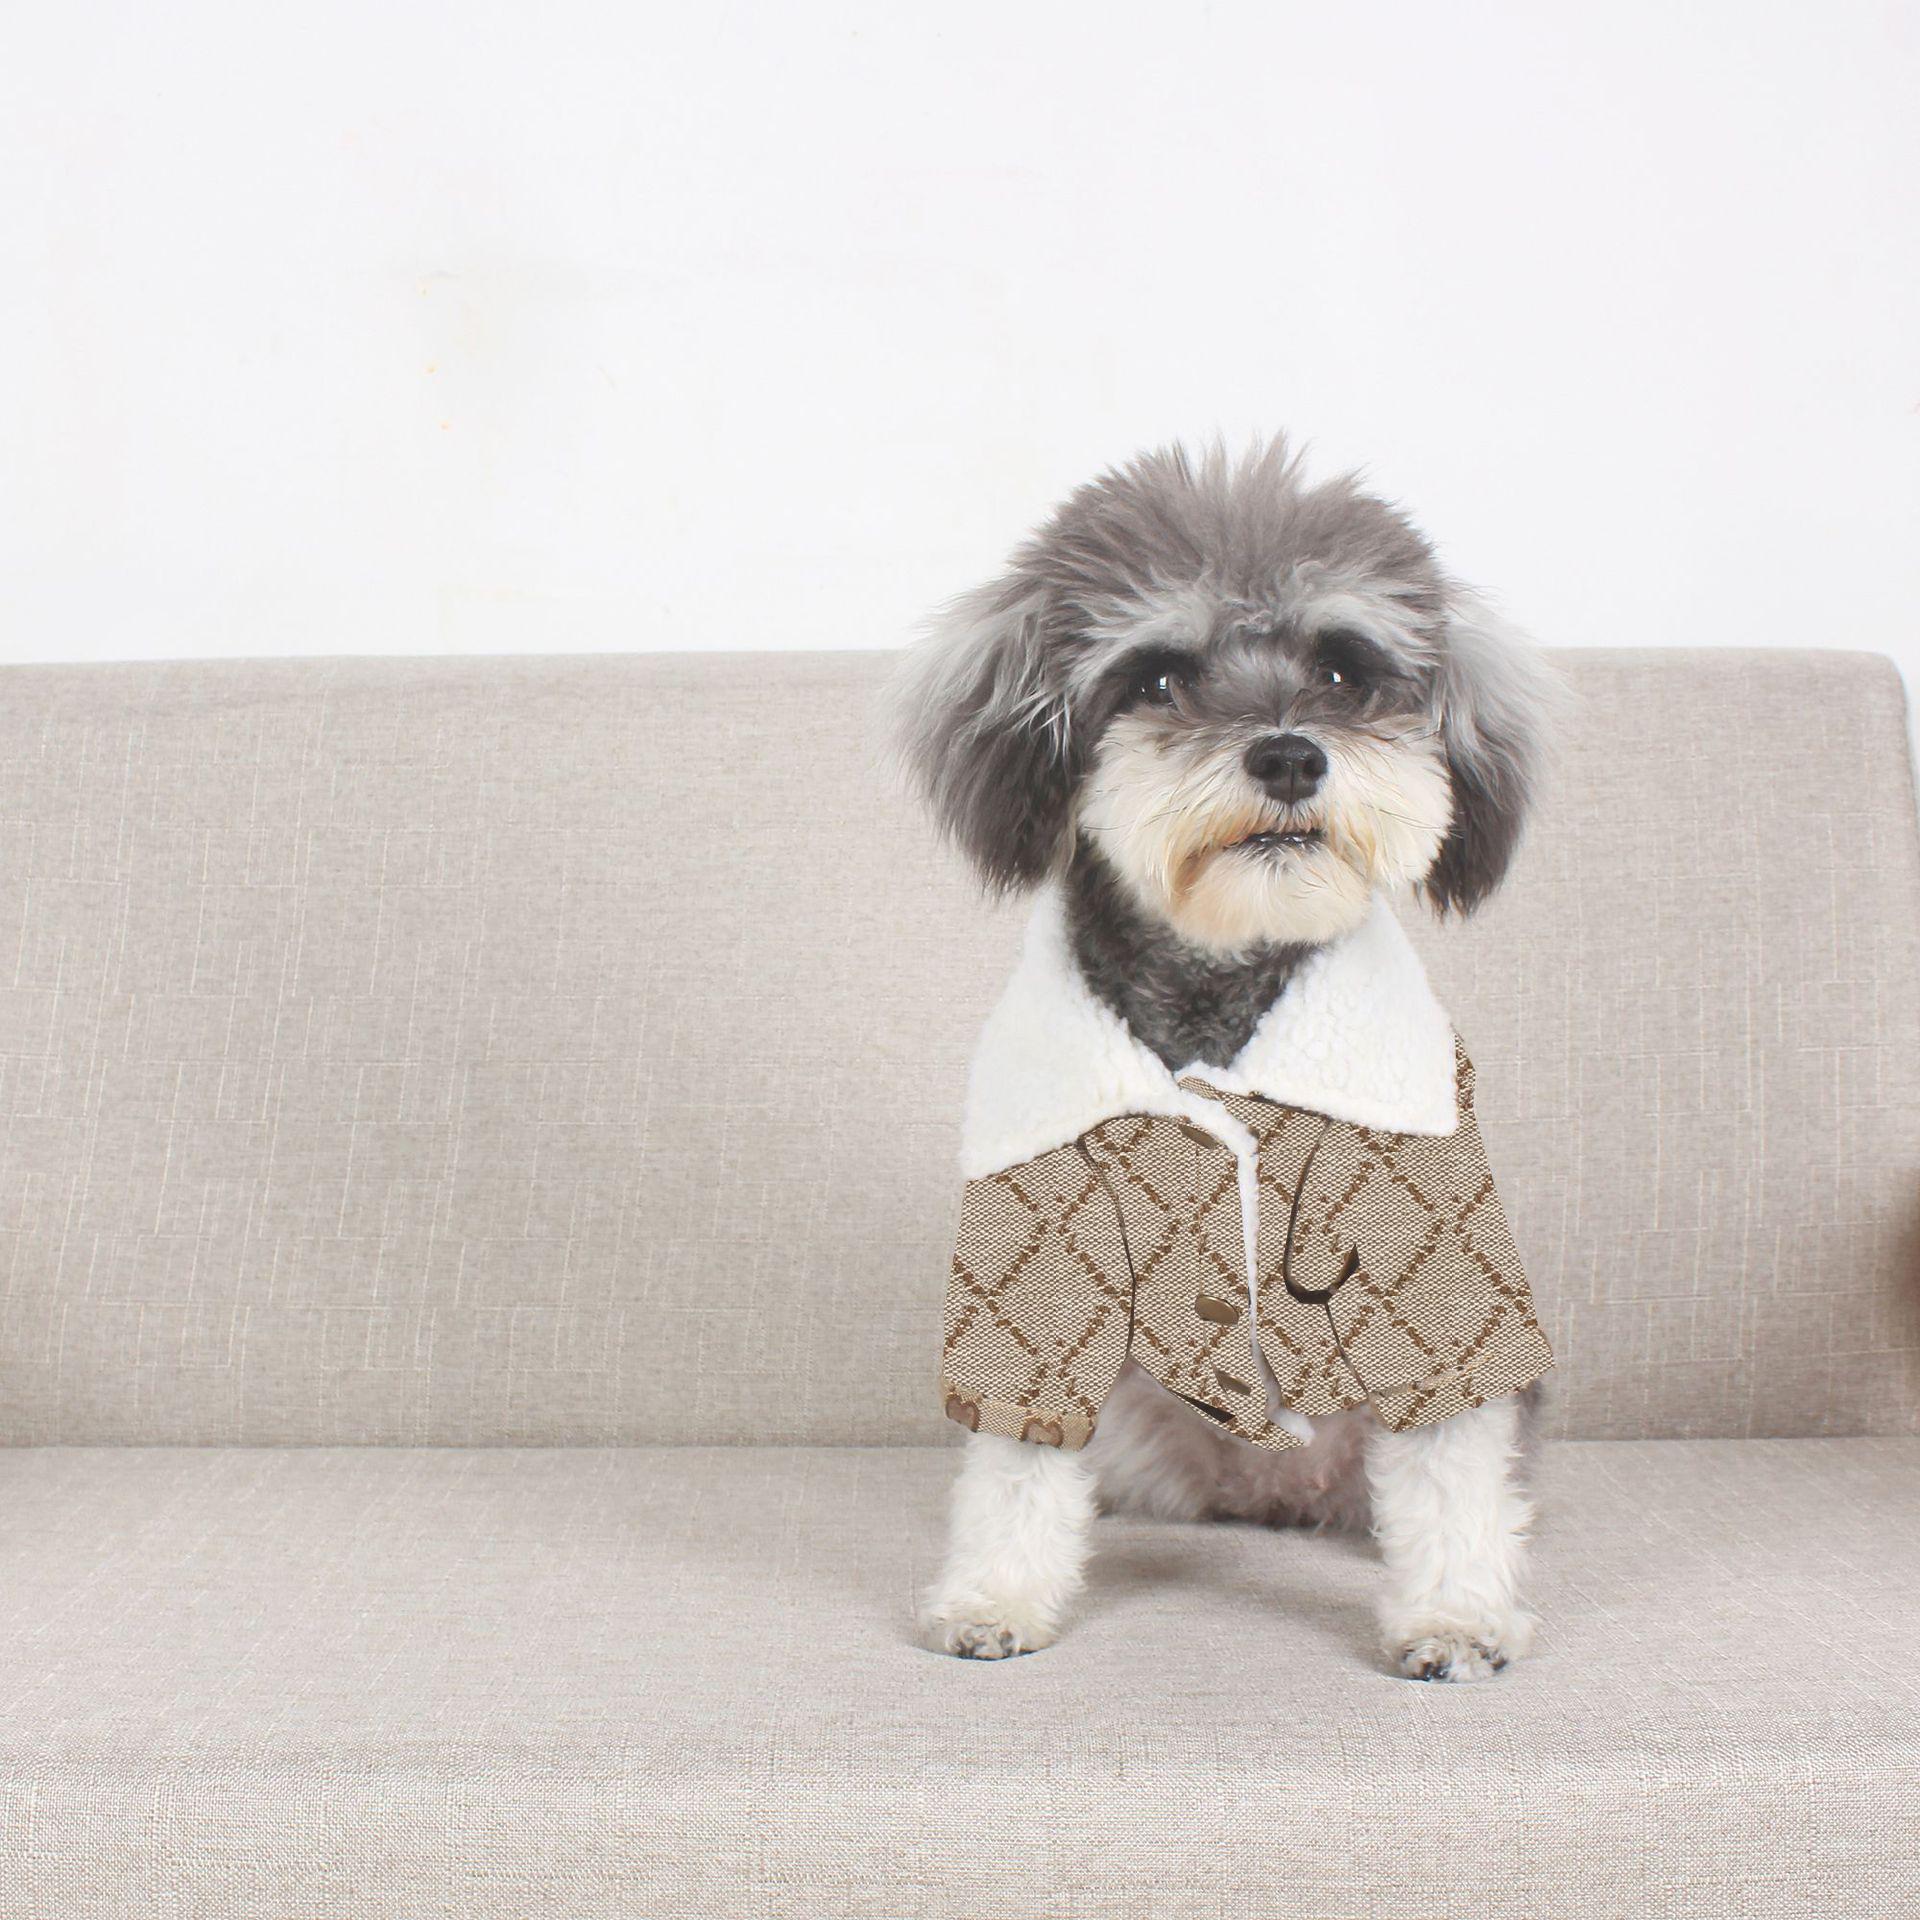 Berber Fleece Coat Dog Apparel Winter Keep Warm Plaid Brown Wool Jackets Puppy Cat Pet Clothes